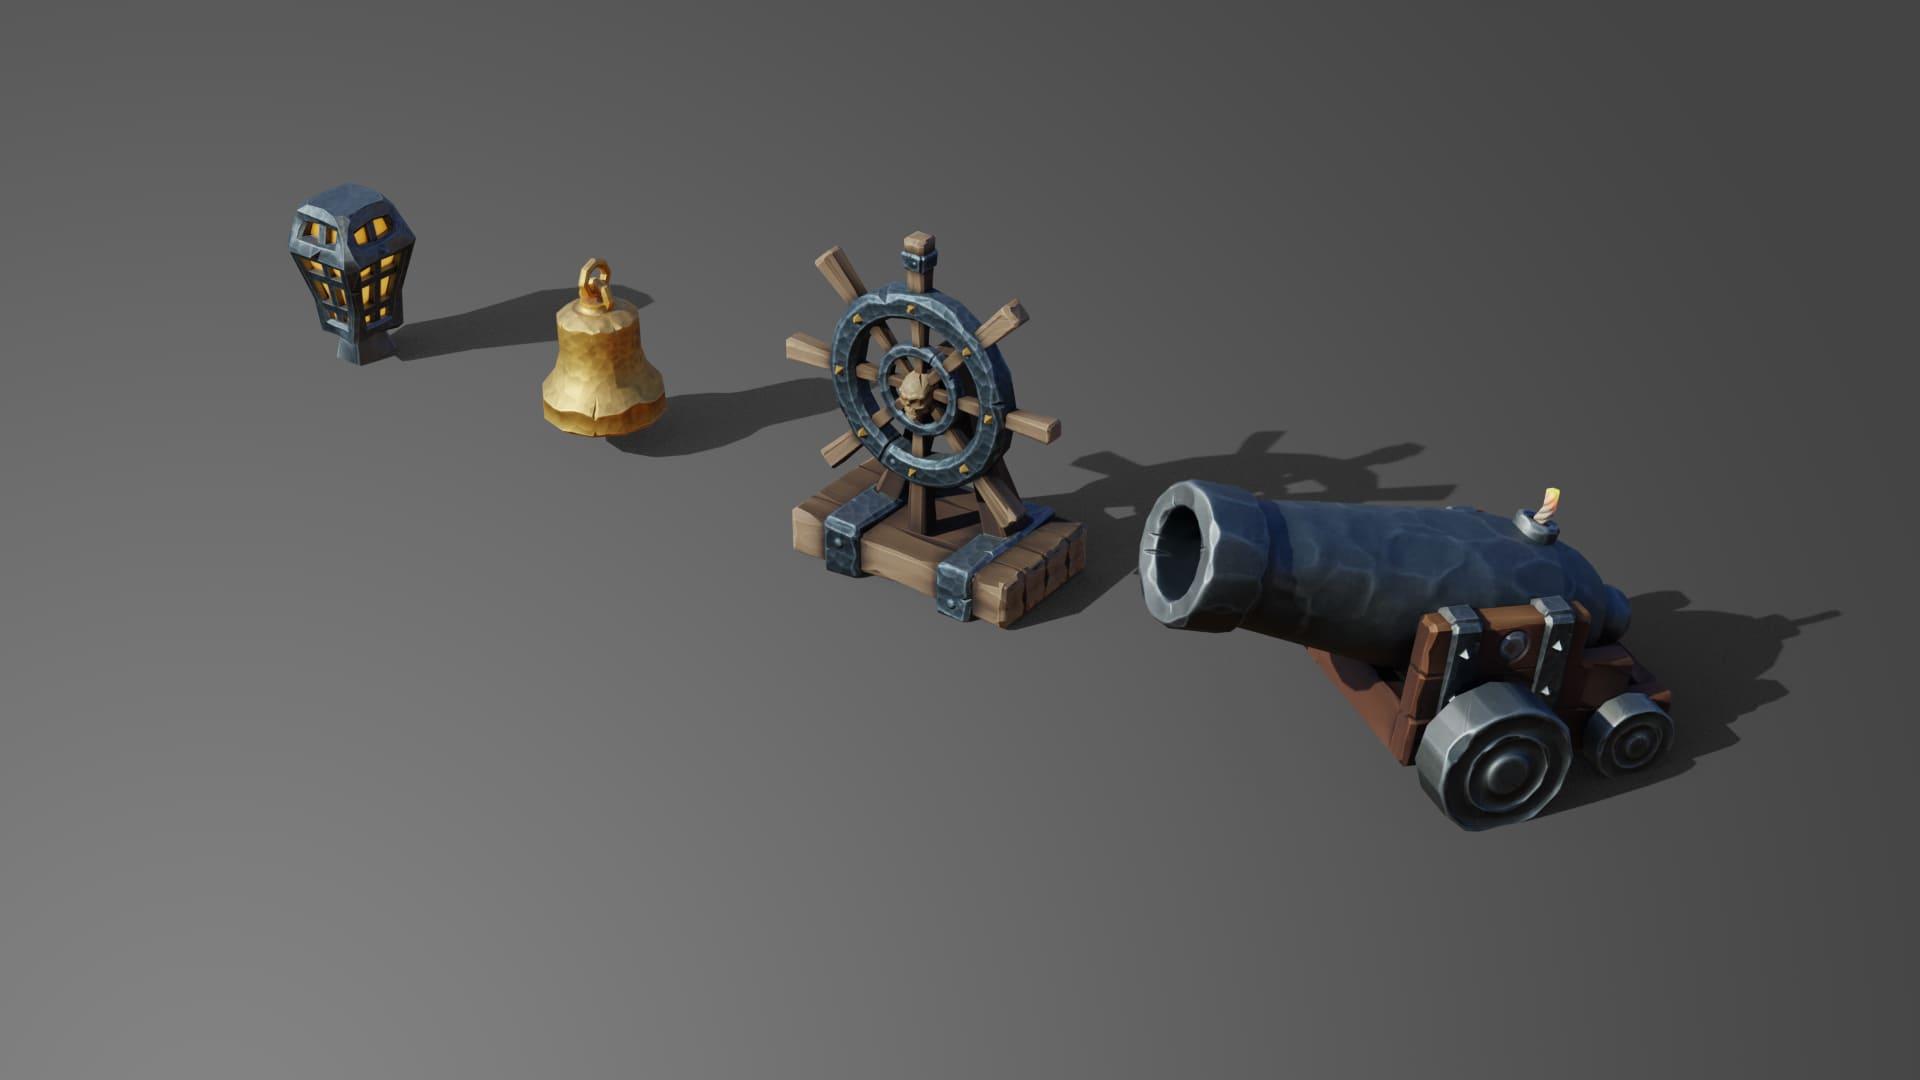 3D art outsourcing studio - Blender, ZBrush, Maya